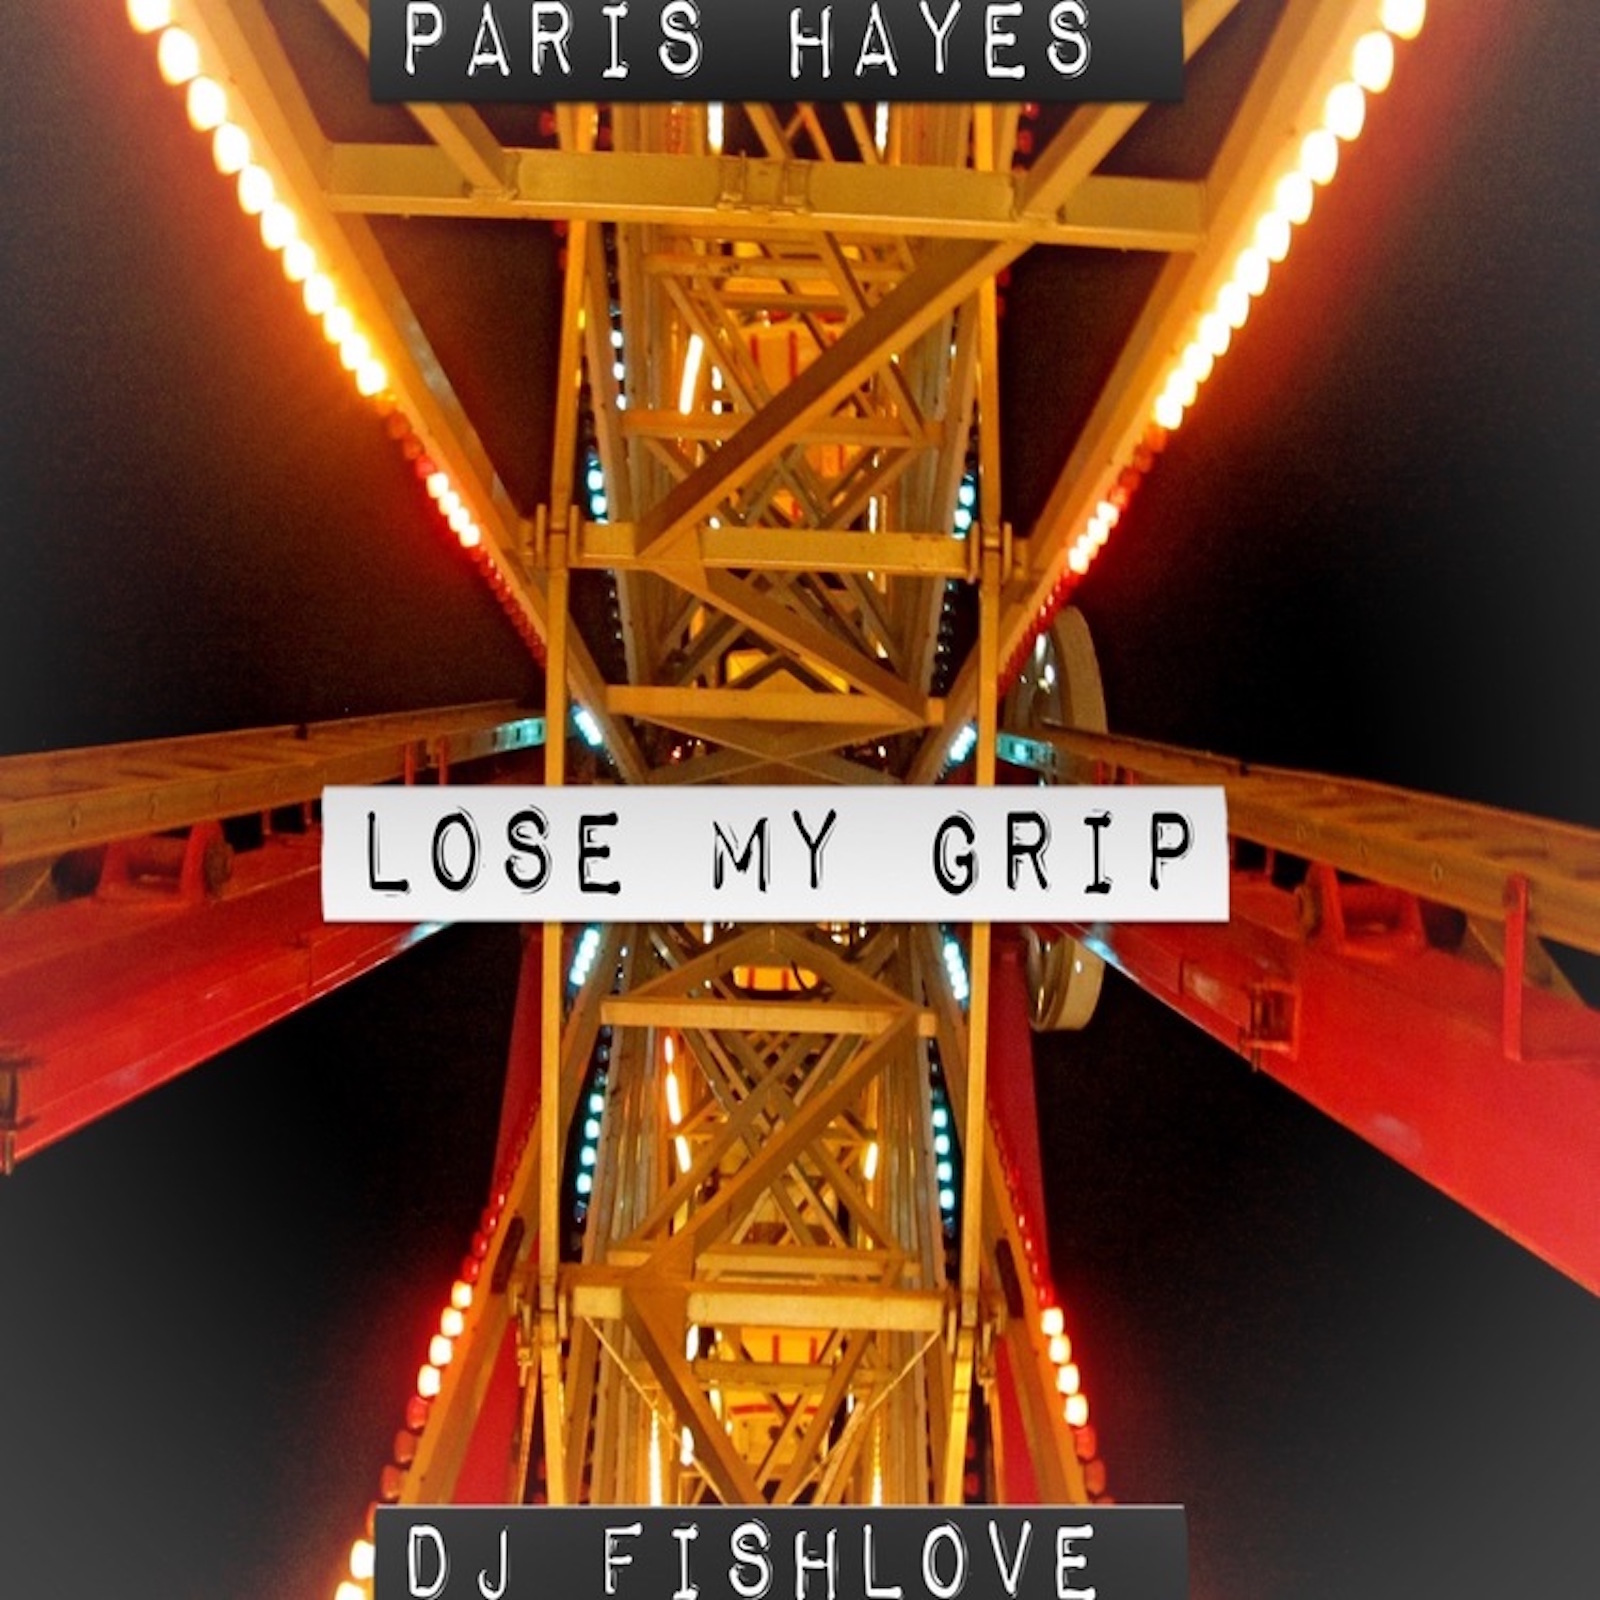 Lose My Grip - Vocals: Paris HayesBeat: DJ Fishlove© Paris Hayes Music